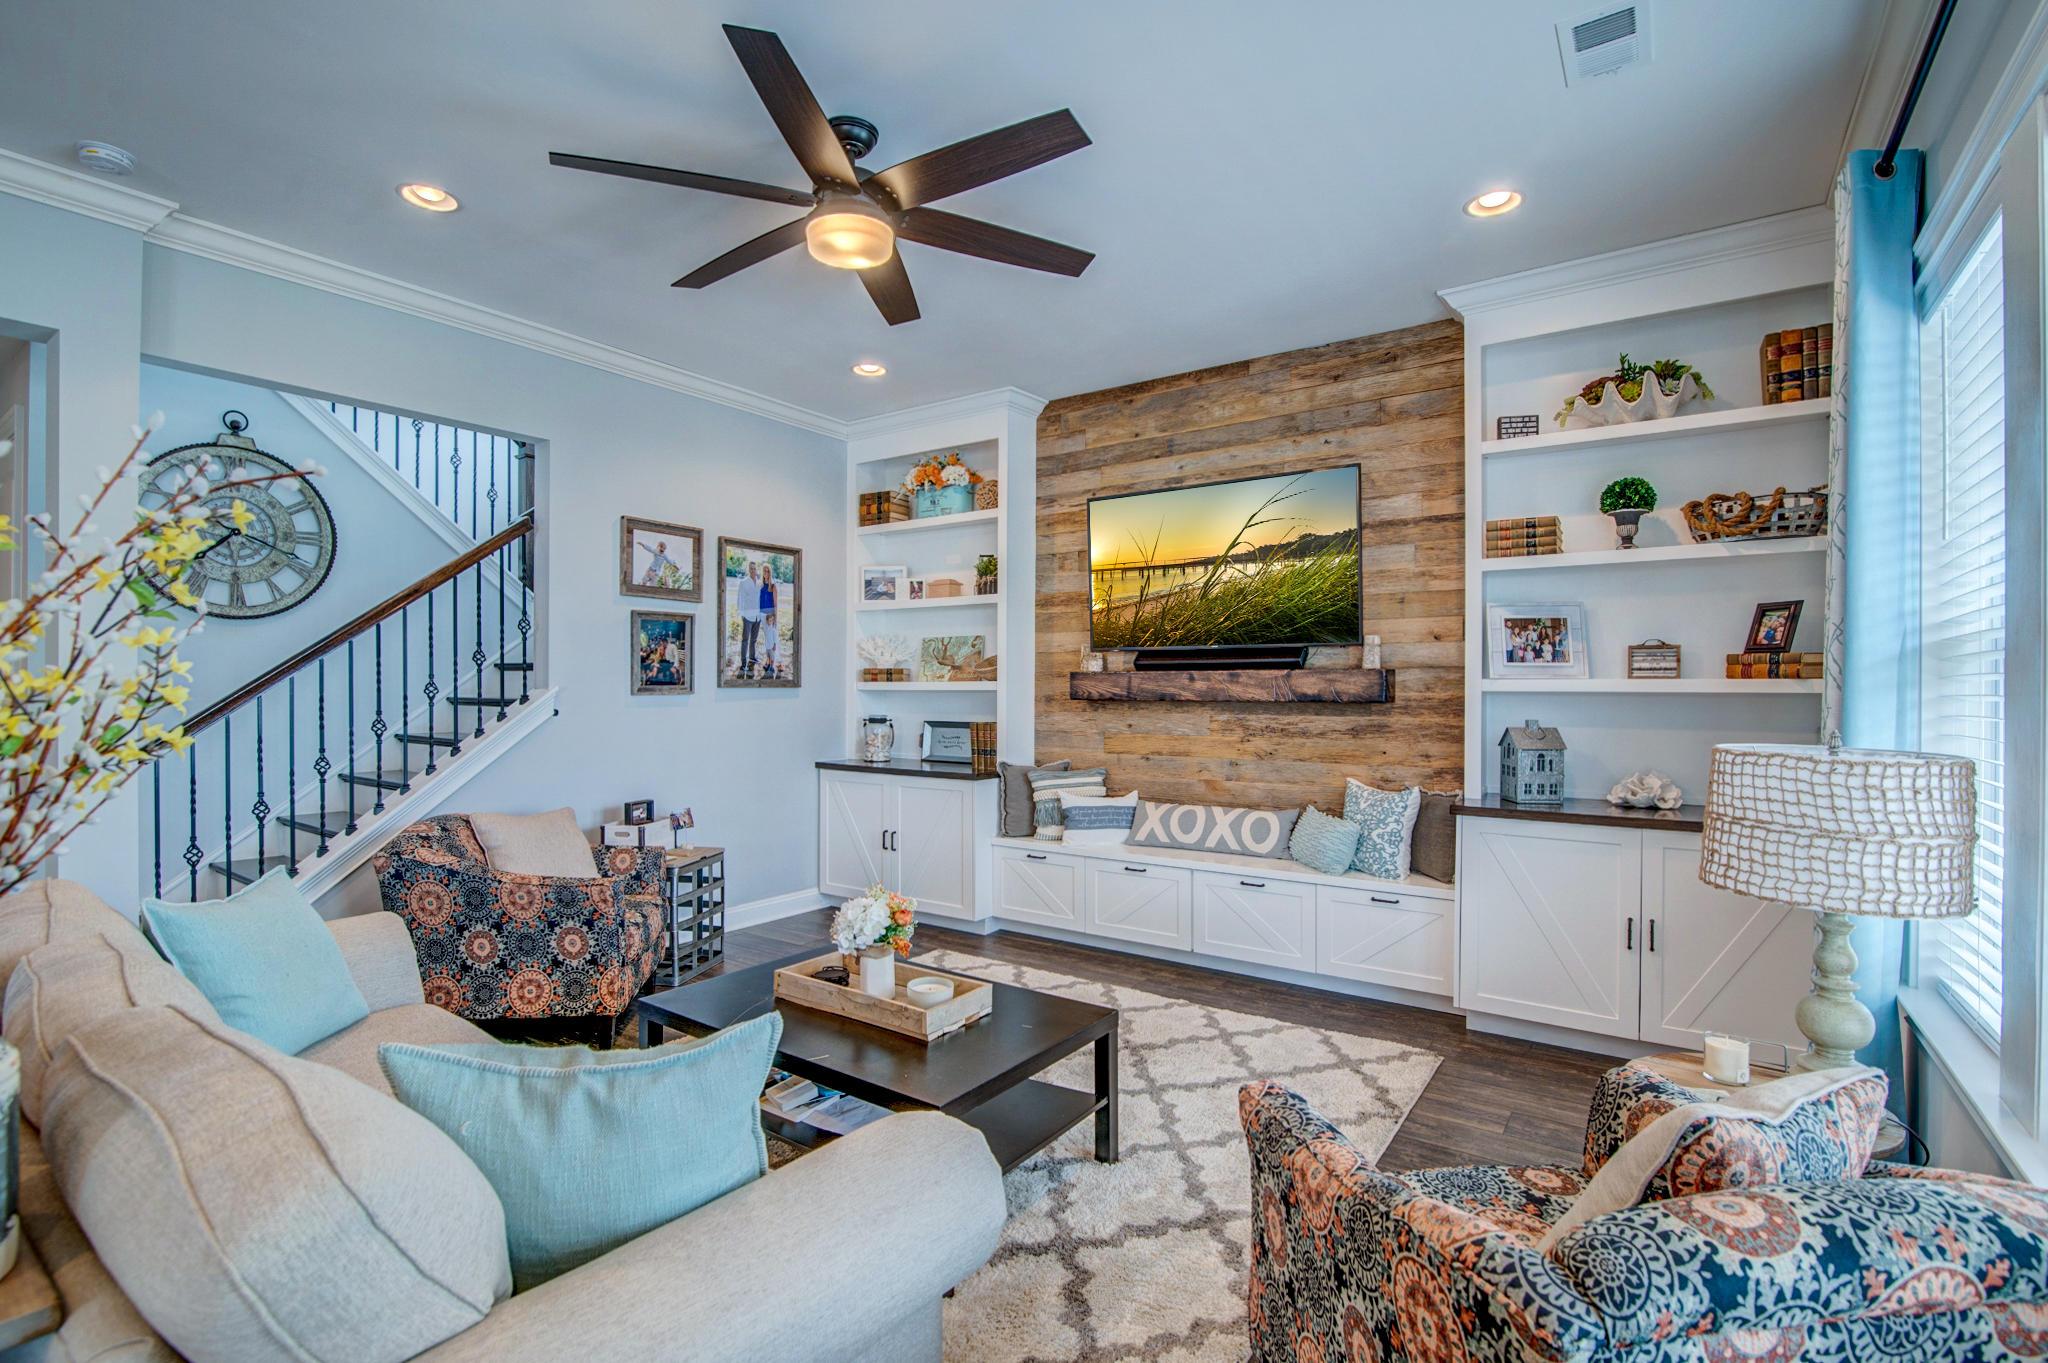 Carolina Park Homes For Sale - 3634 Spindrift, Mount Pleasant, SC - 20